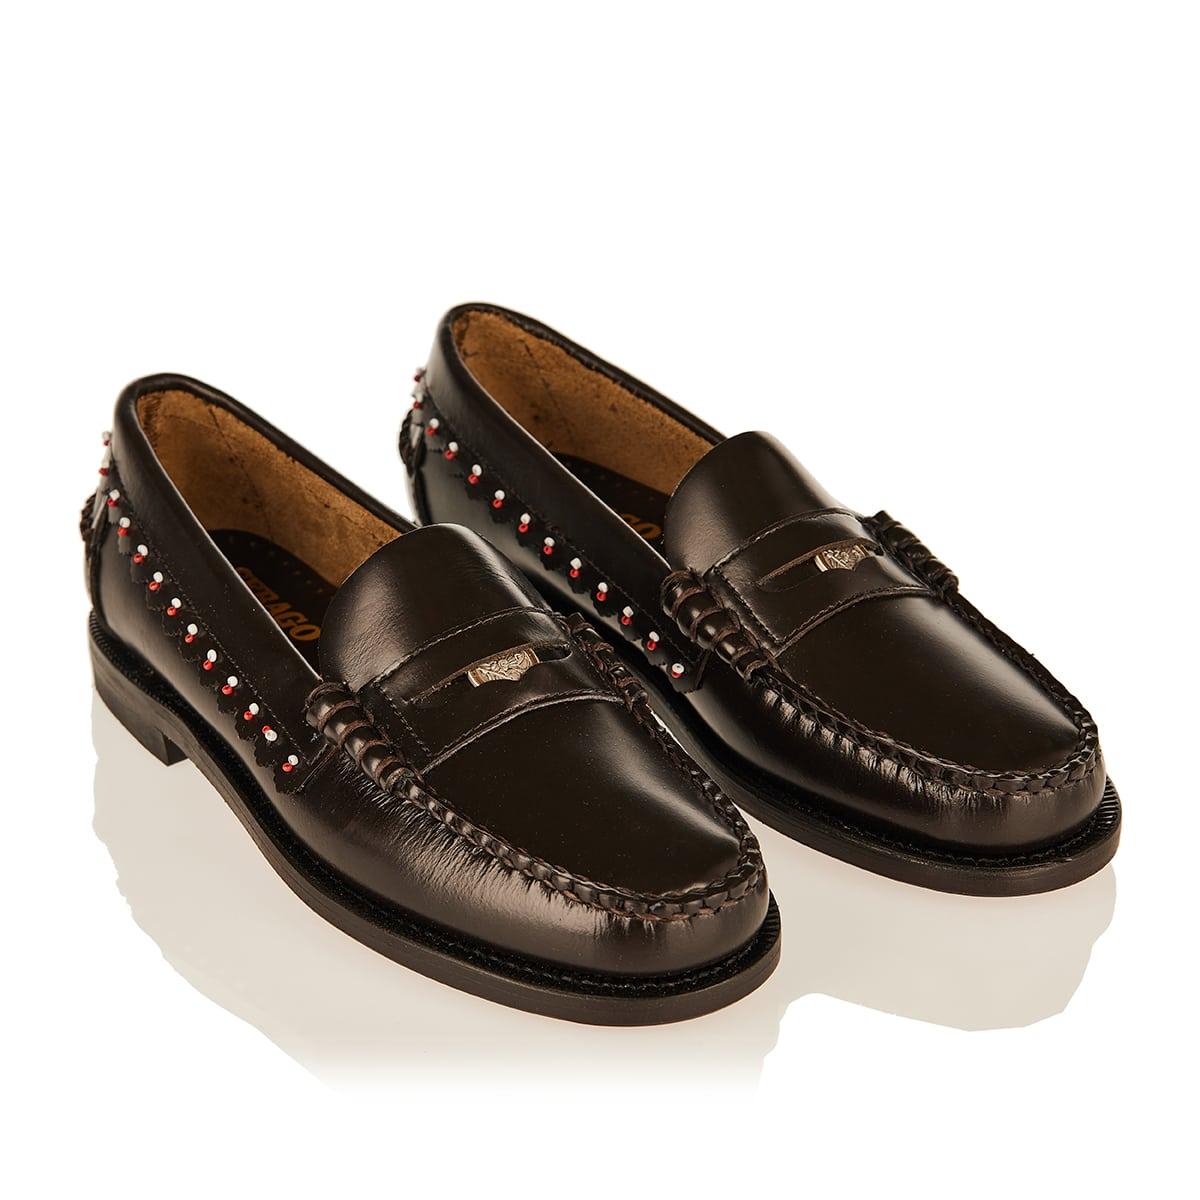 Dan embellished leather loafers